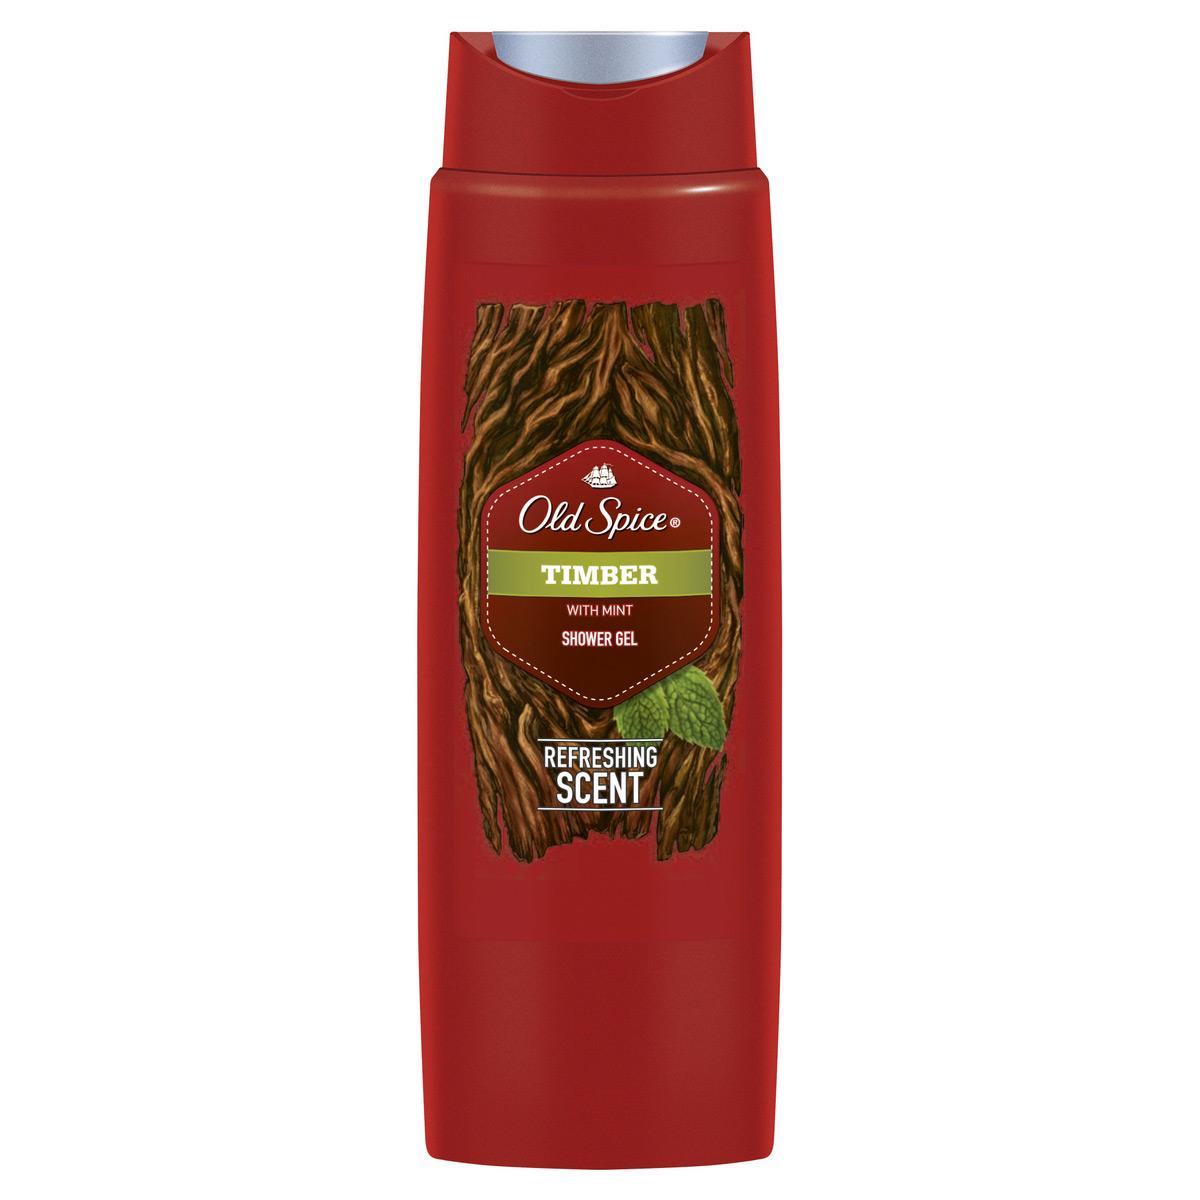 гель д душа old spice timber 250мл OLD SPICE Гель для душа Timber 25 0мл